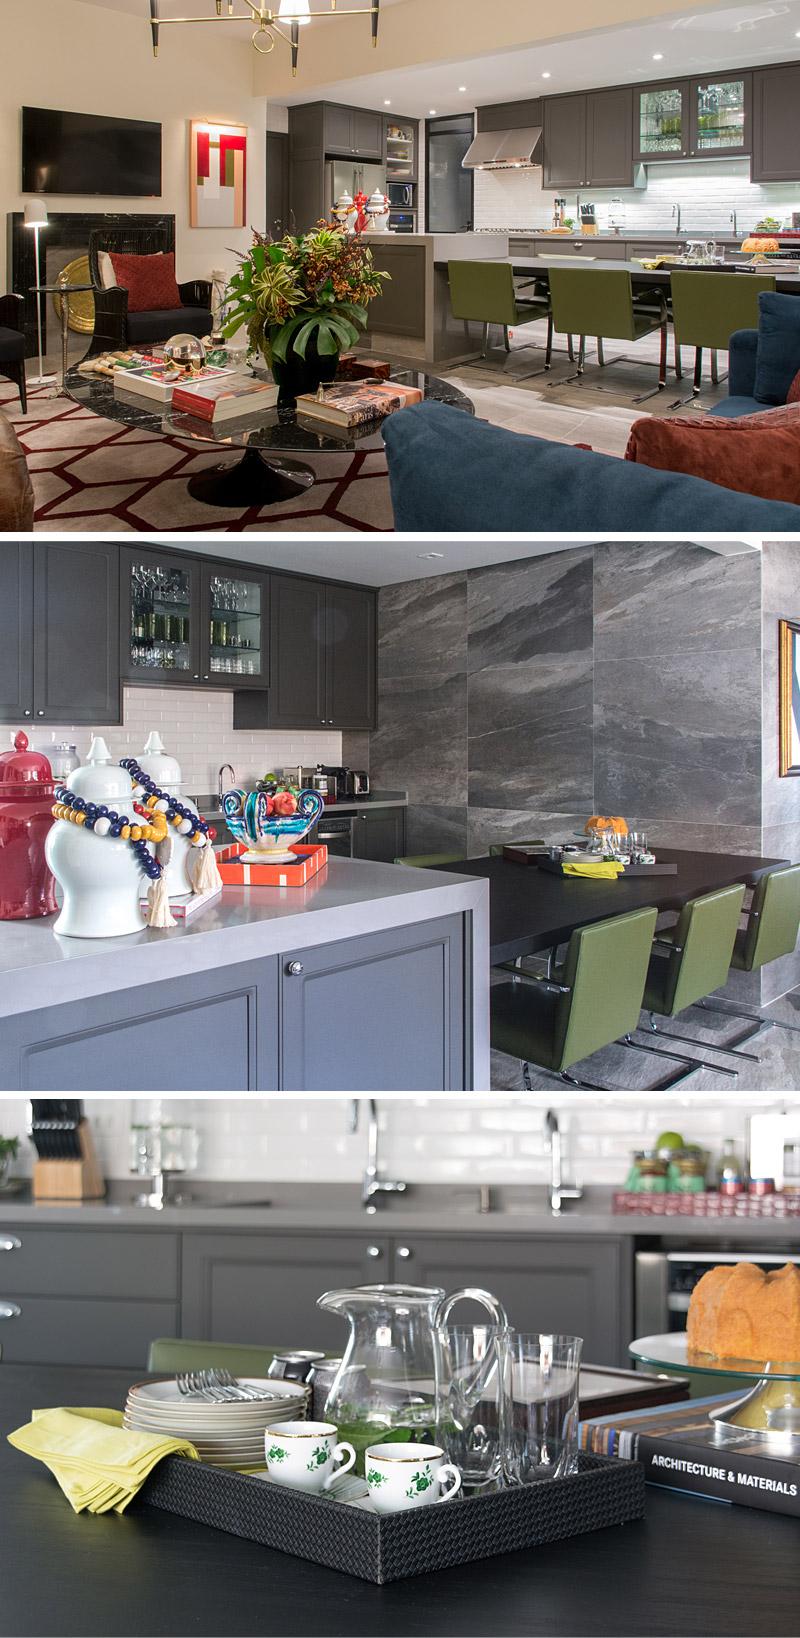 living-gazette-barbara-resende-decor-sala-ecletica-thales-decordhome-cozinha-balcao